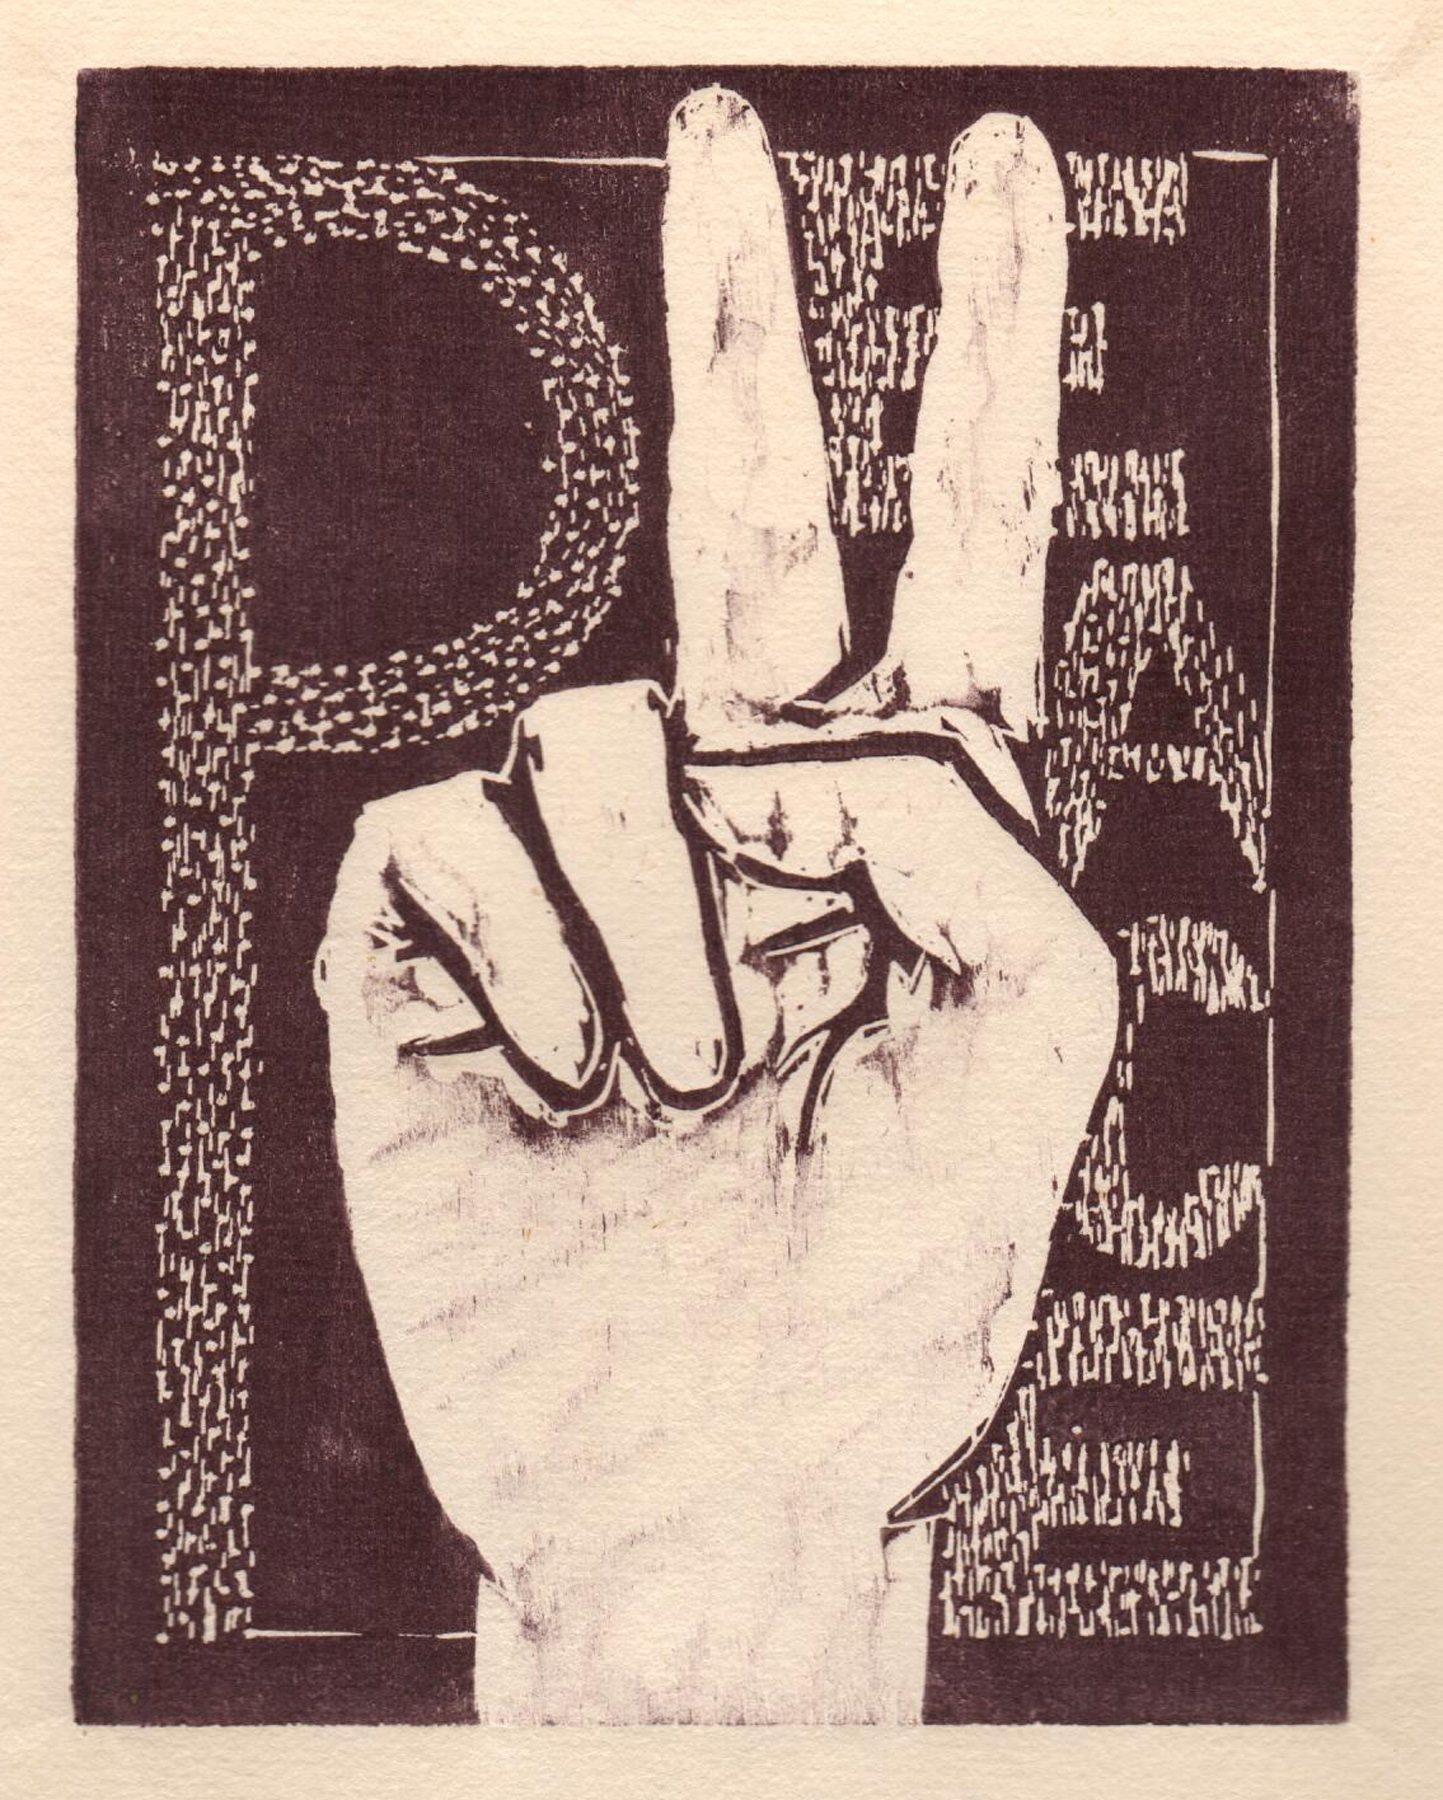 "'Helping Hands, Peace', woodcut, 6.5"" x 5"", $80 unframed"